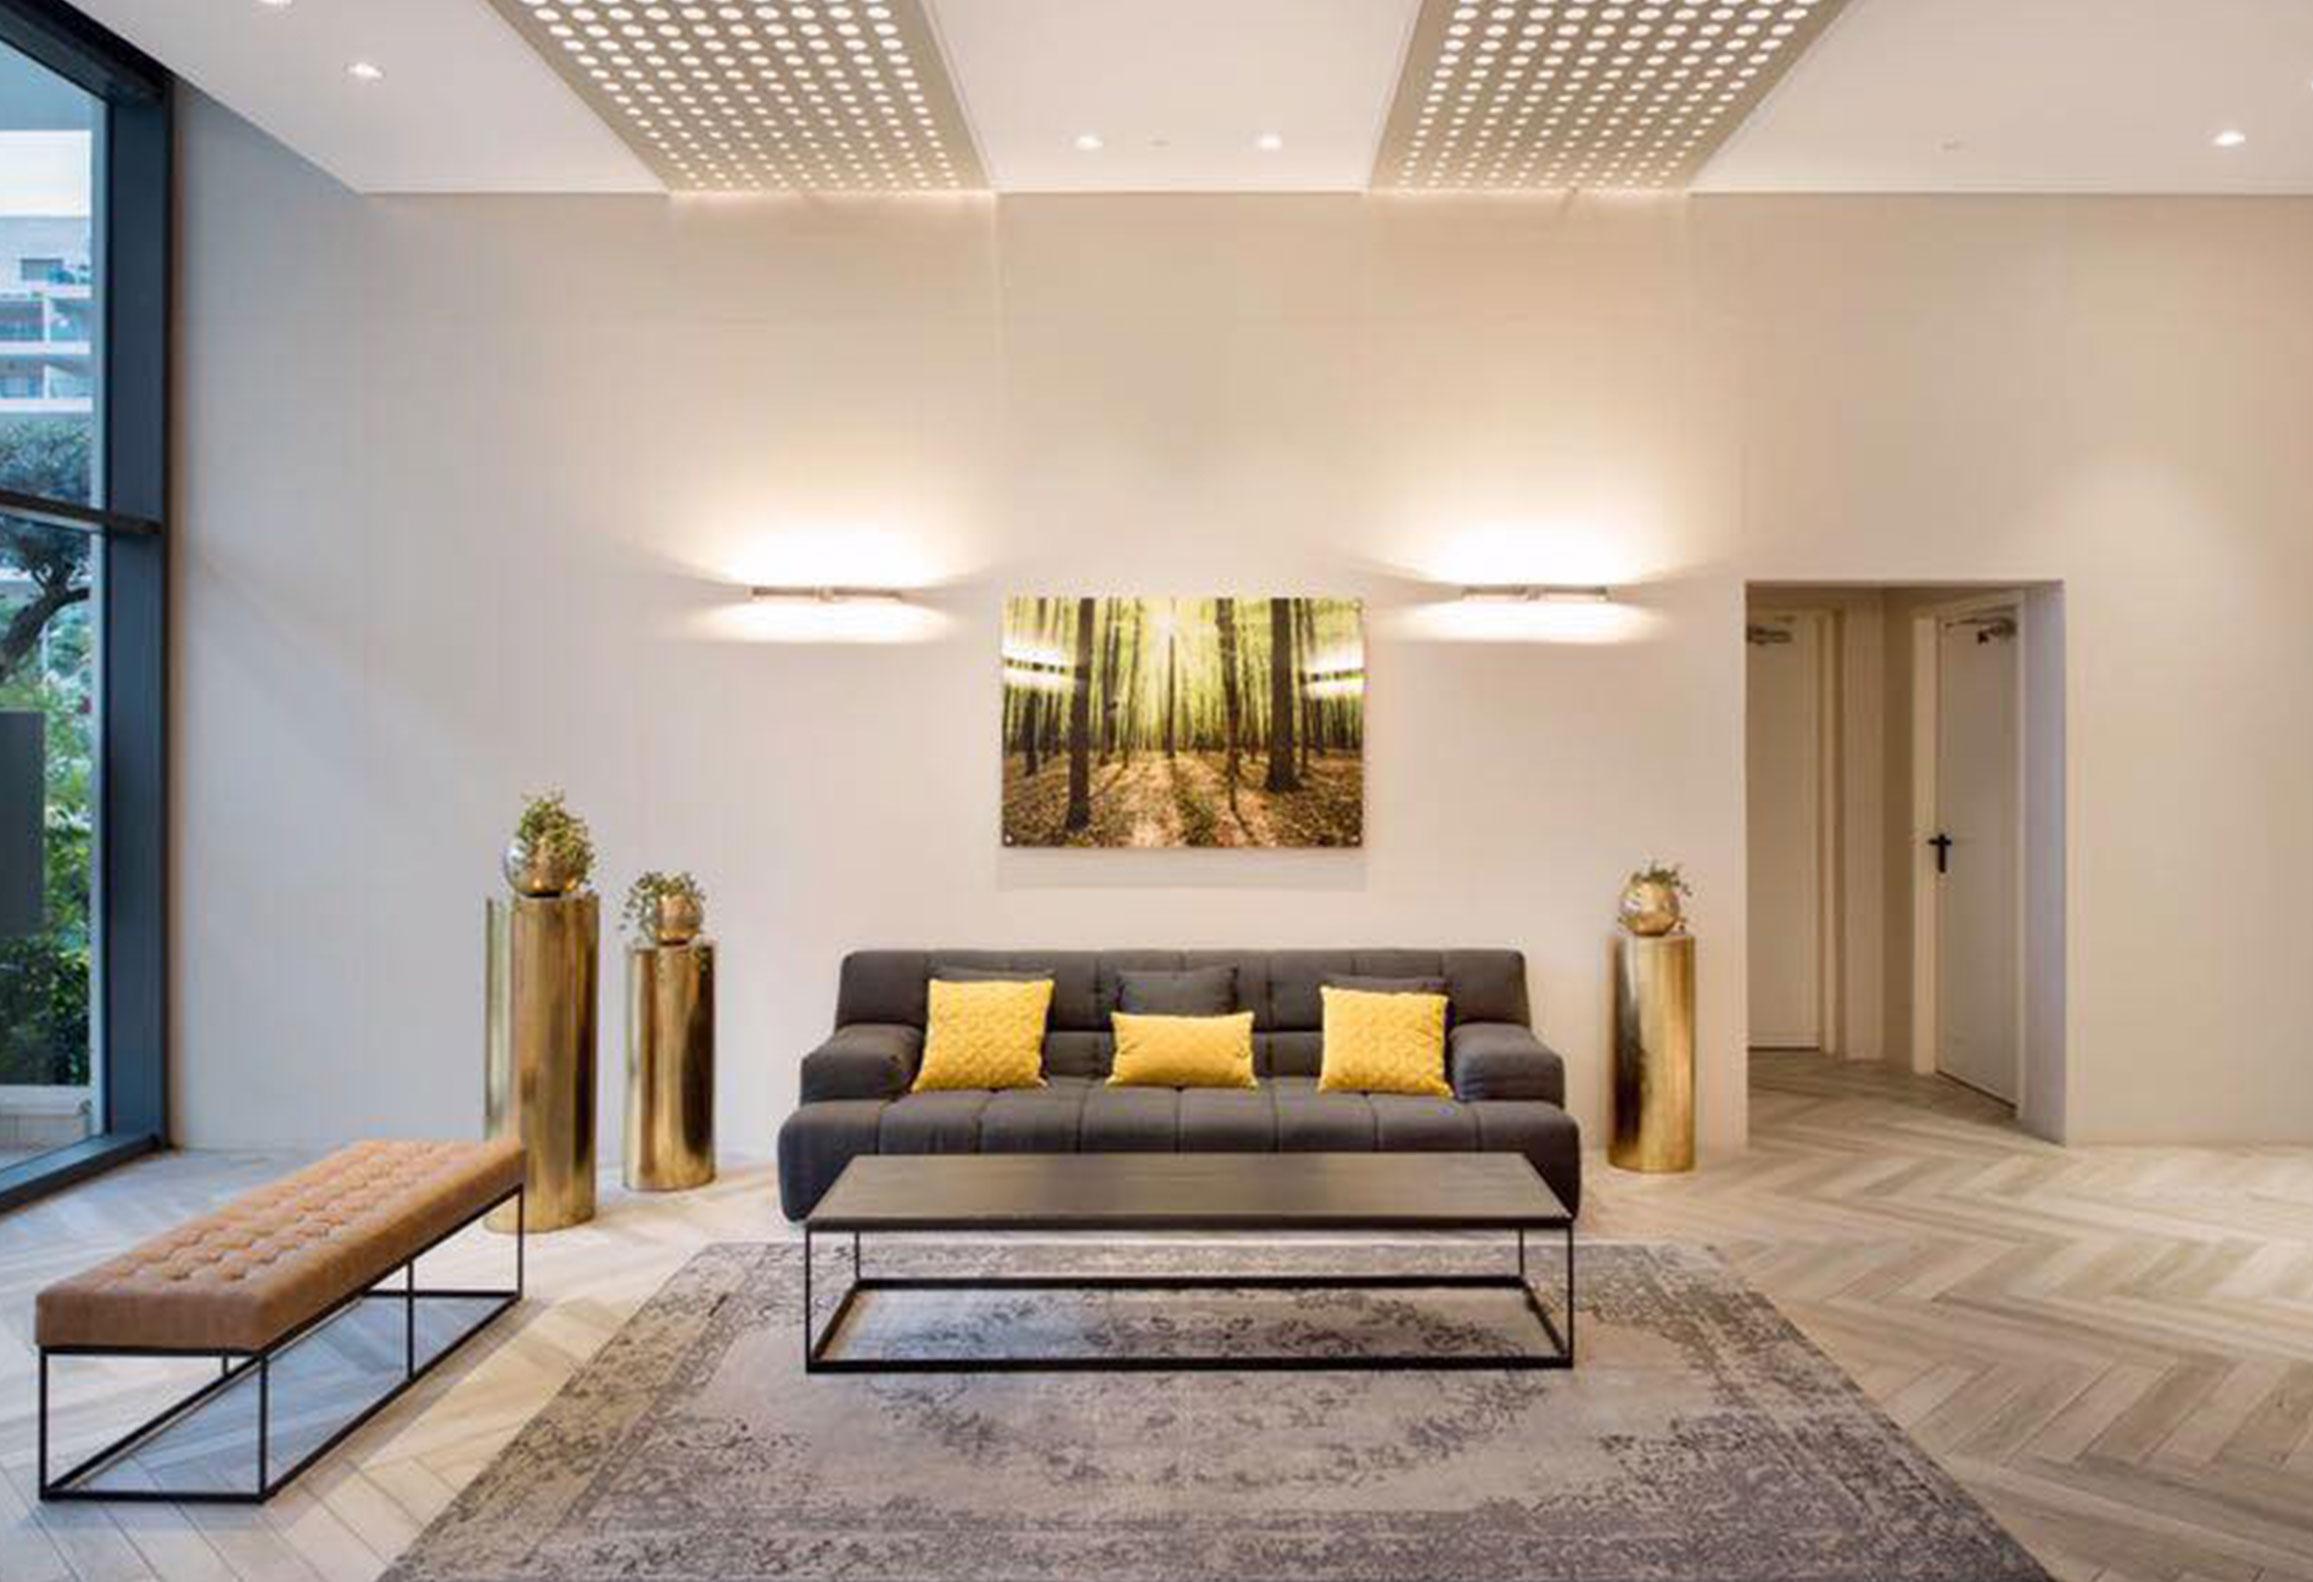 Nurit-Leshem_marom-rishon-le-zion12.11.17-floor-lobby_1.jpg